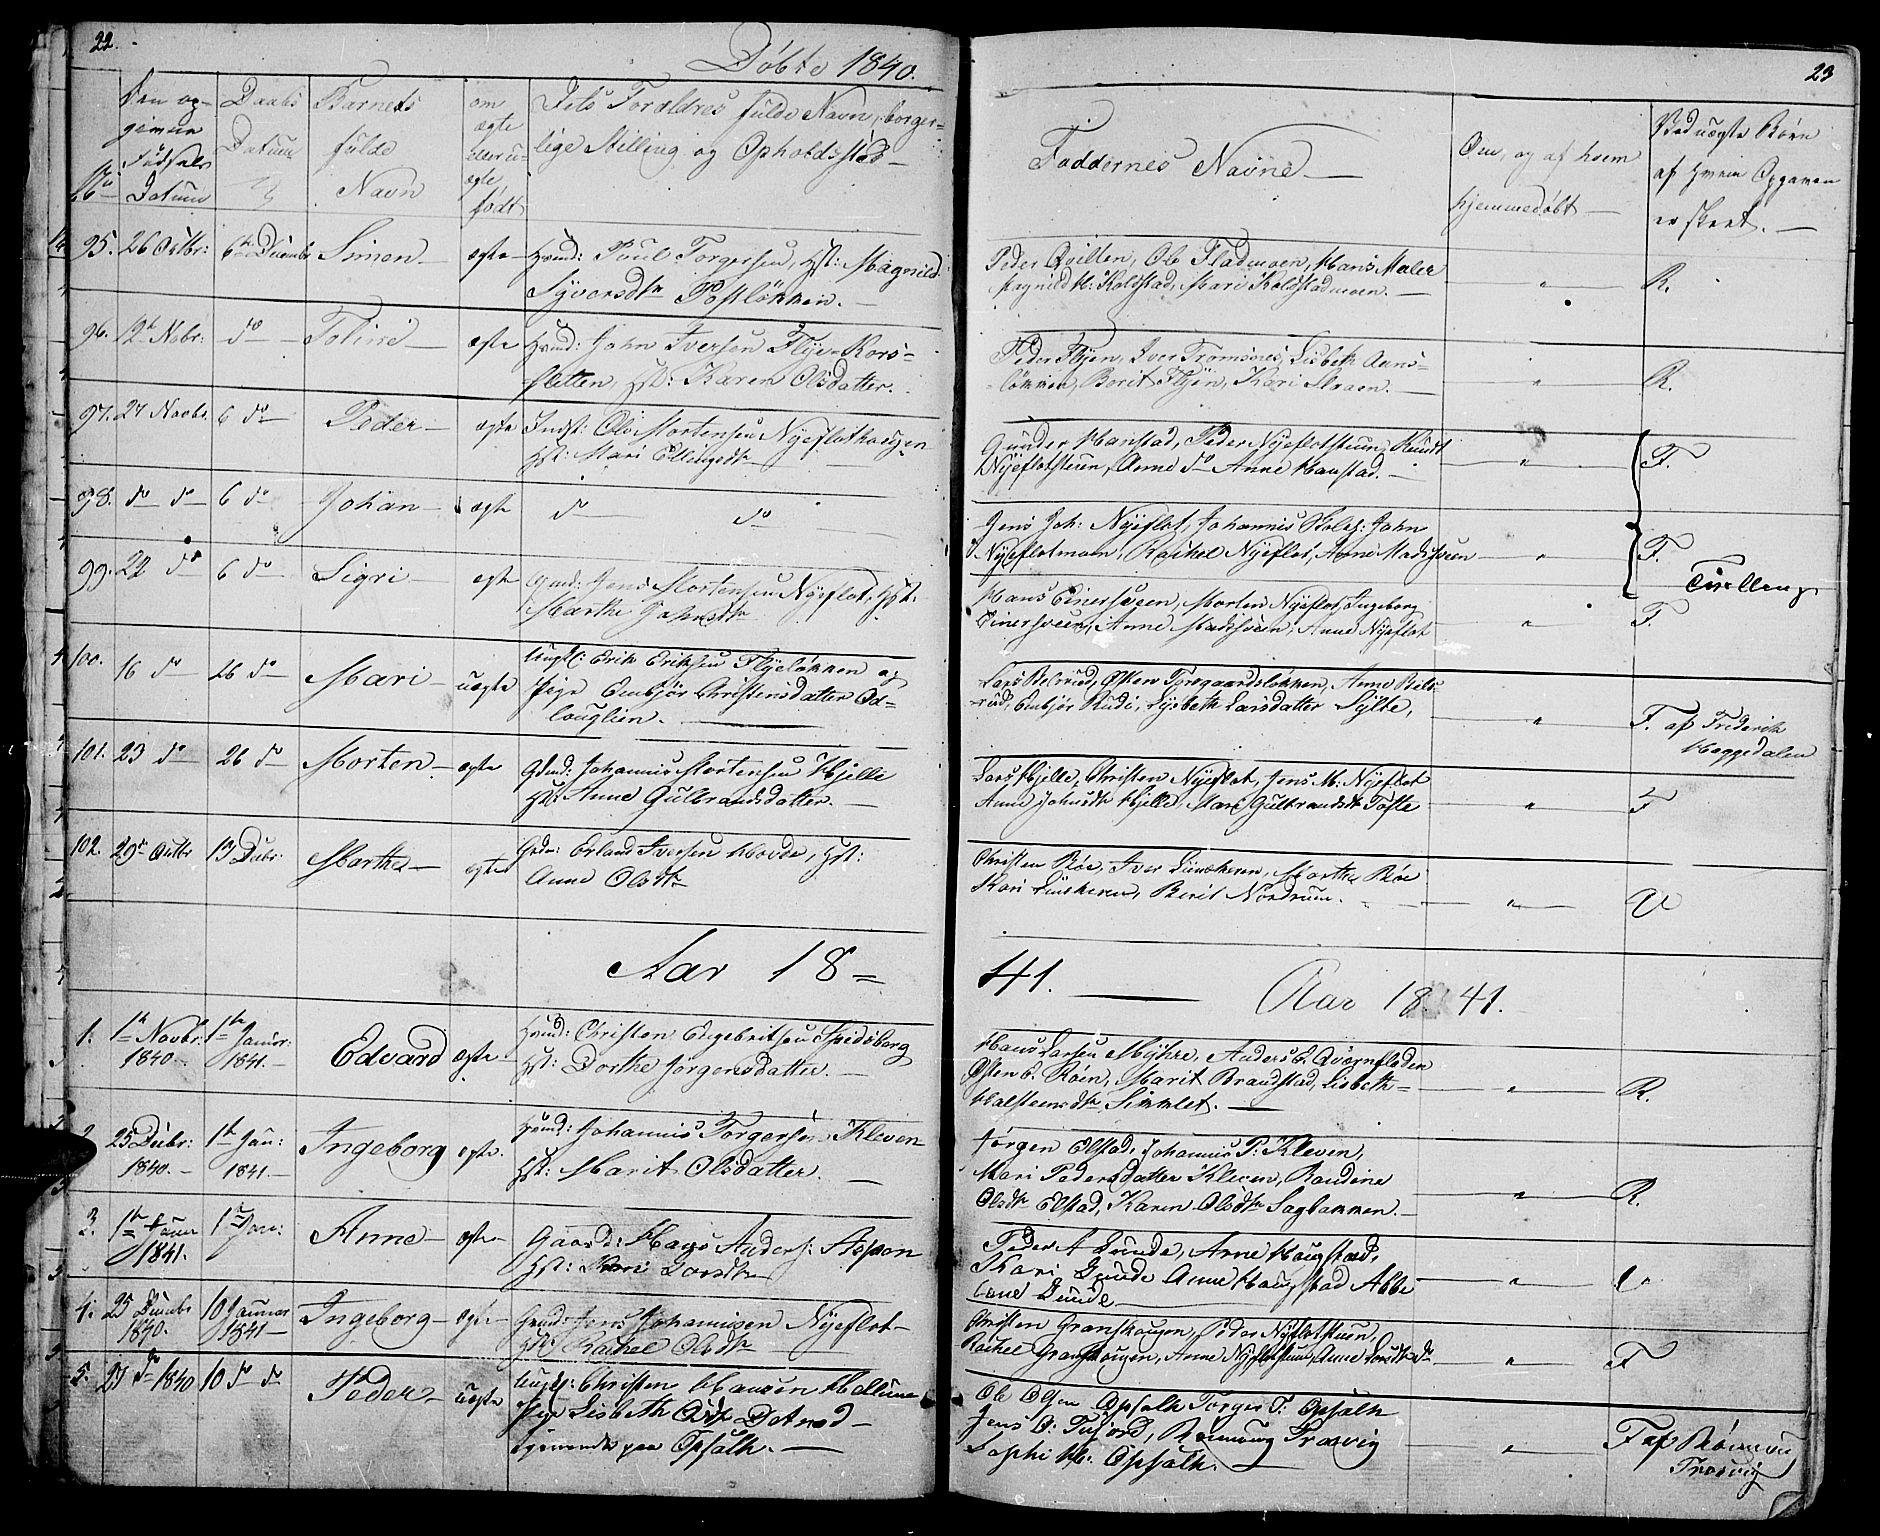 SAH, Ringebu prestekontor, Klokkerbok nr. 2, 1839-1853, s. 22-23